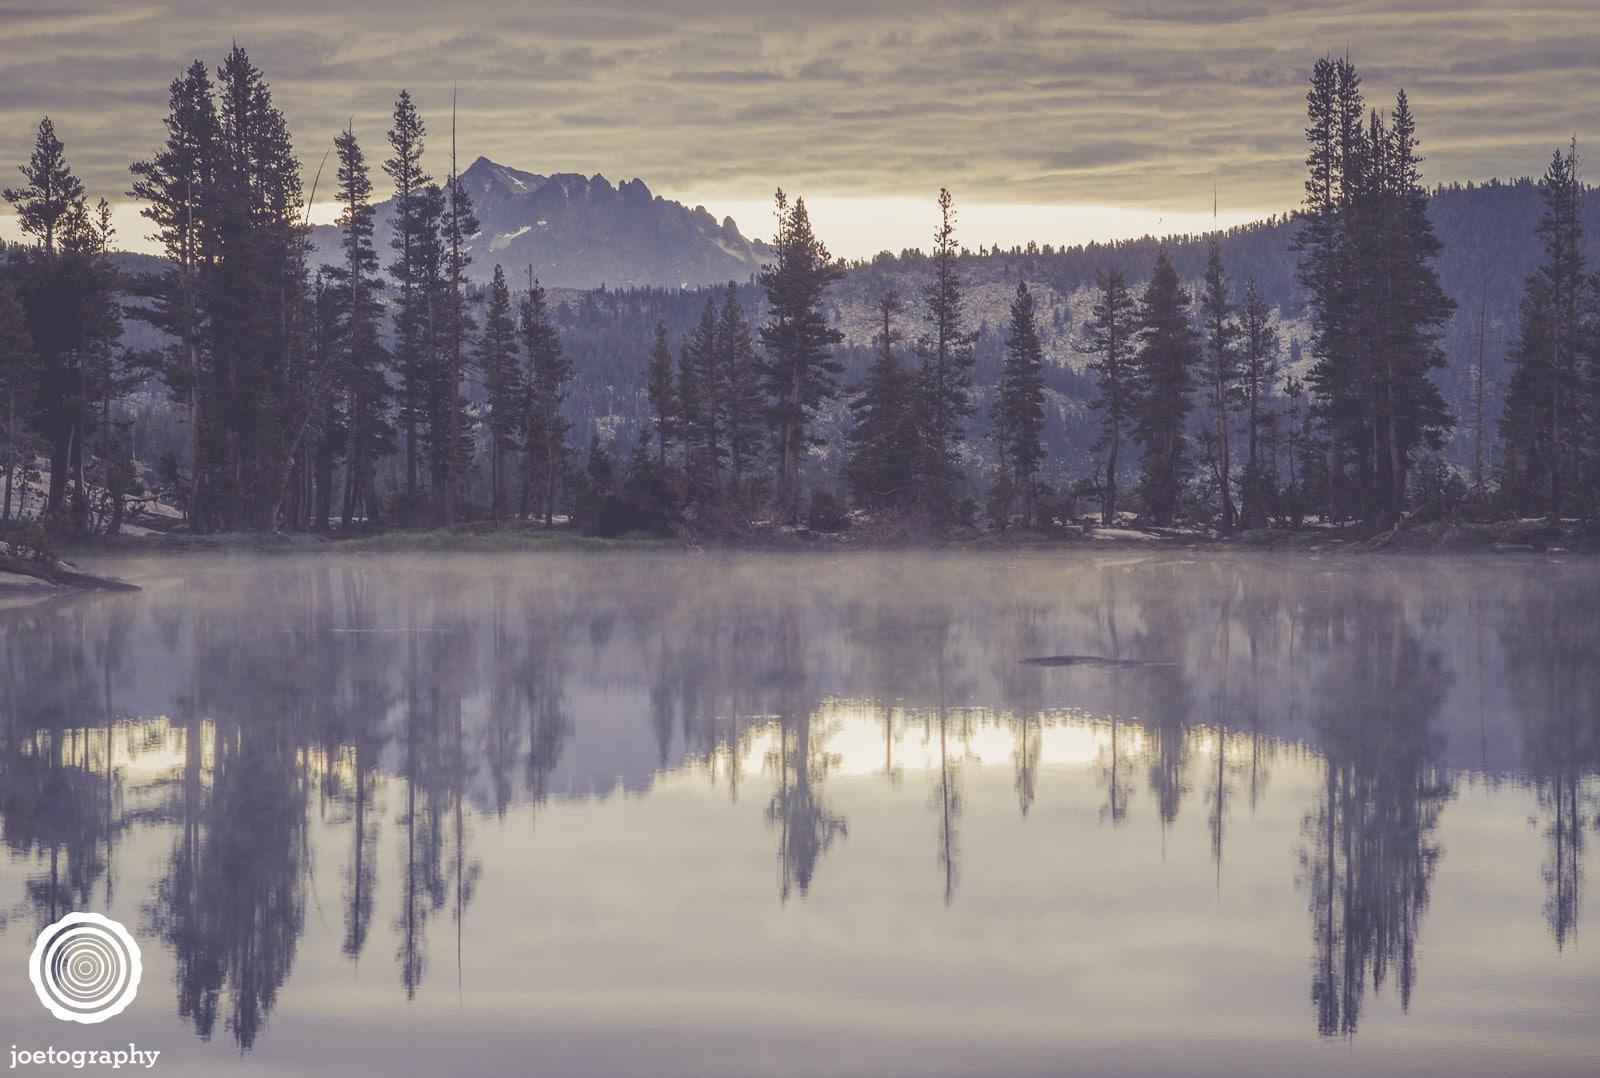 joetography-travel-photography-yosemite-2015-58